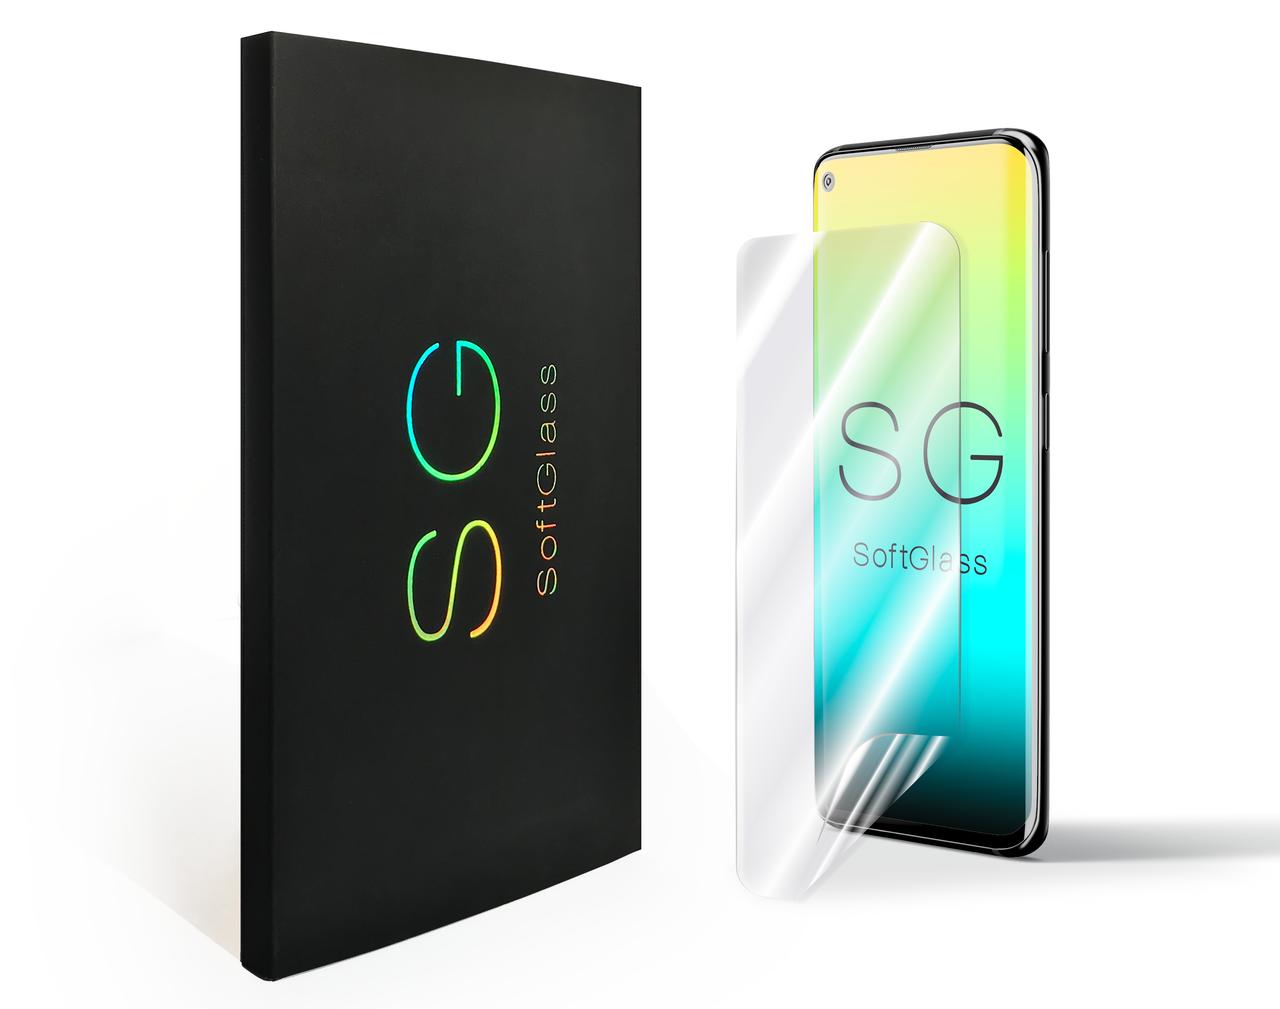 М'яке скло для ZTE A5 2019 SoftGlass Екран